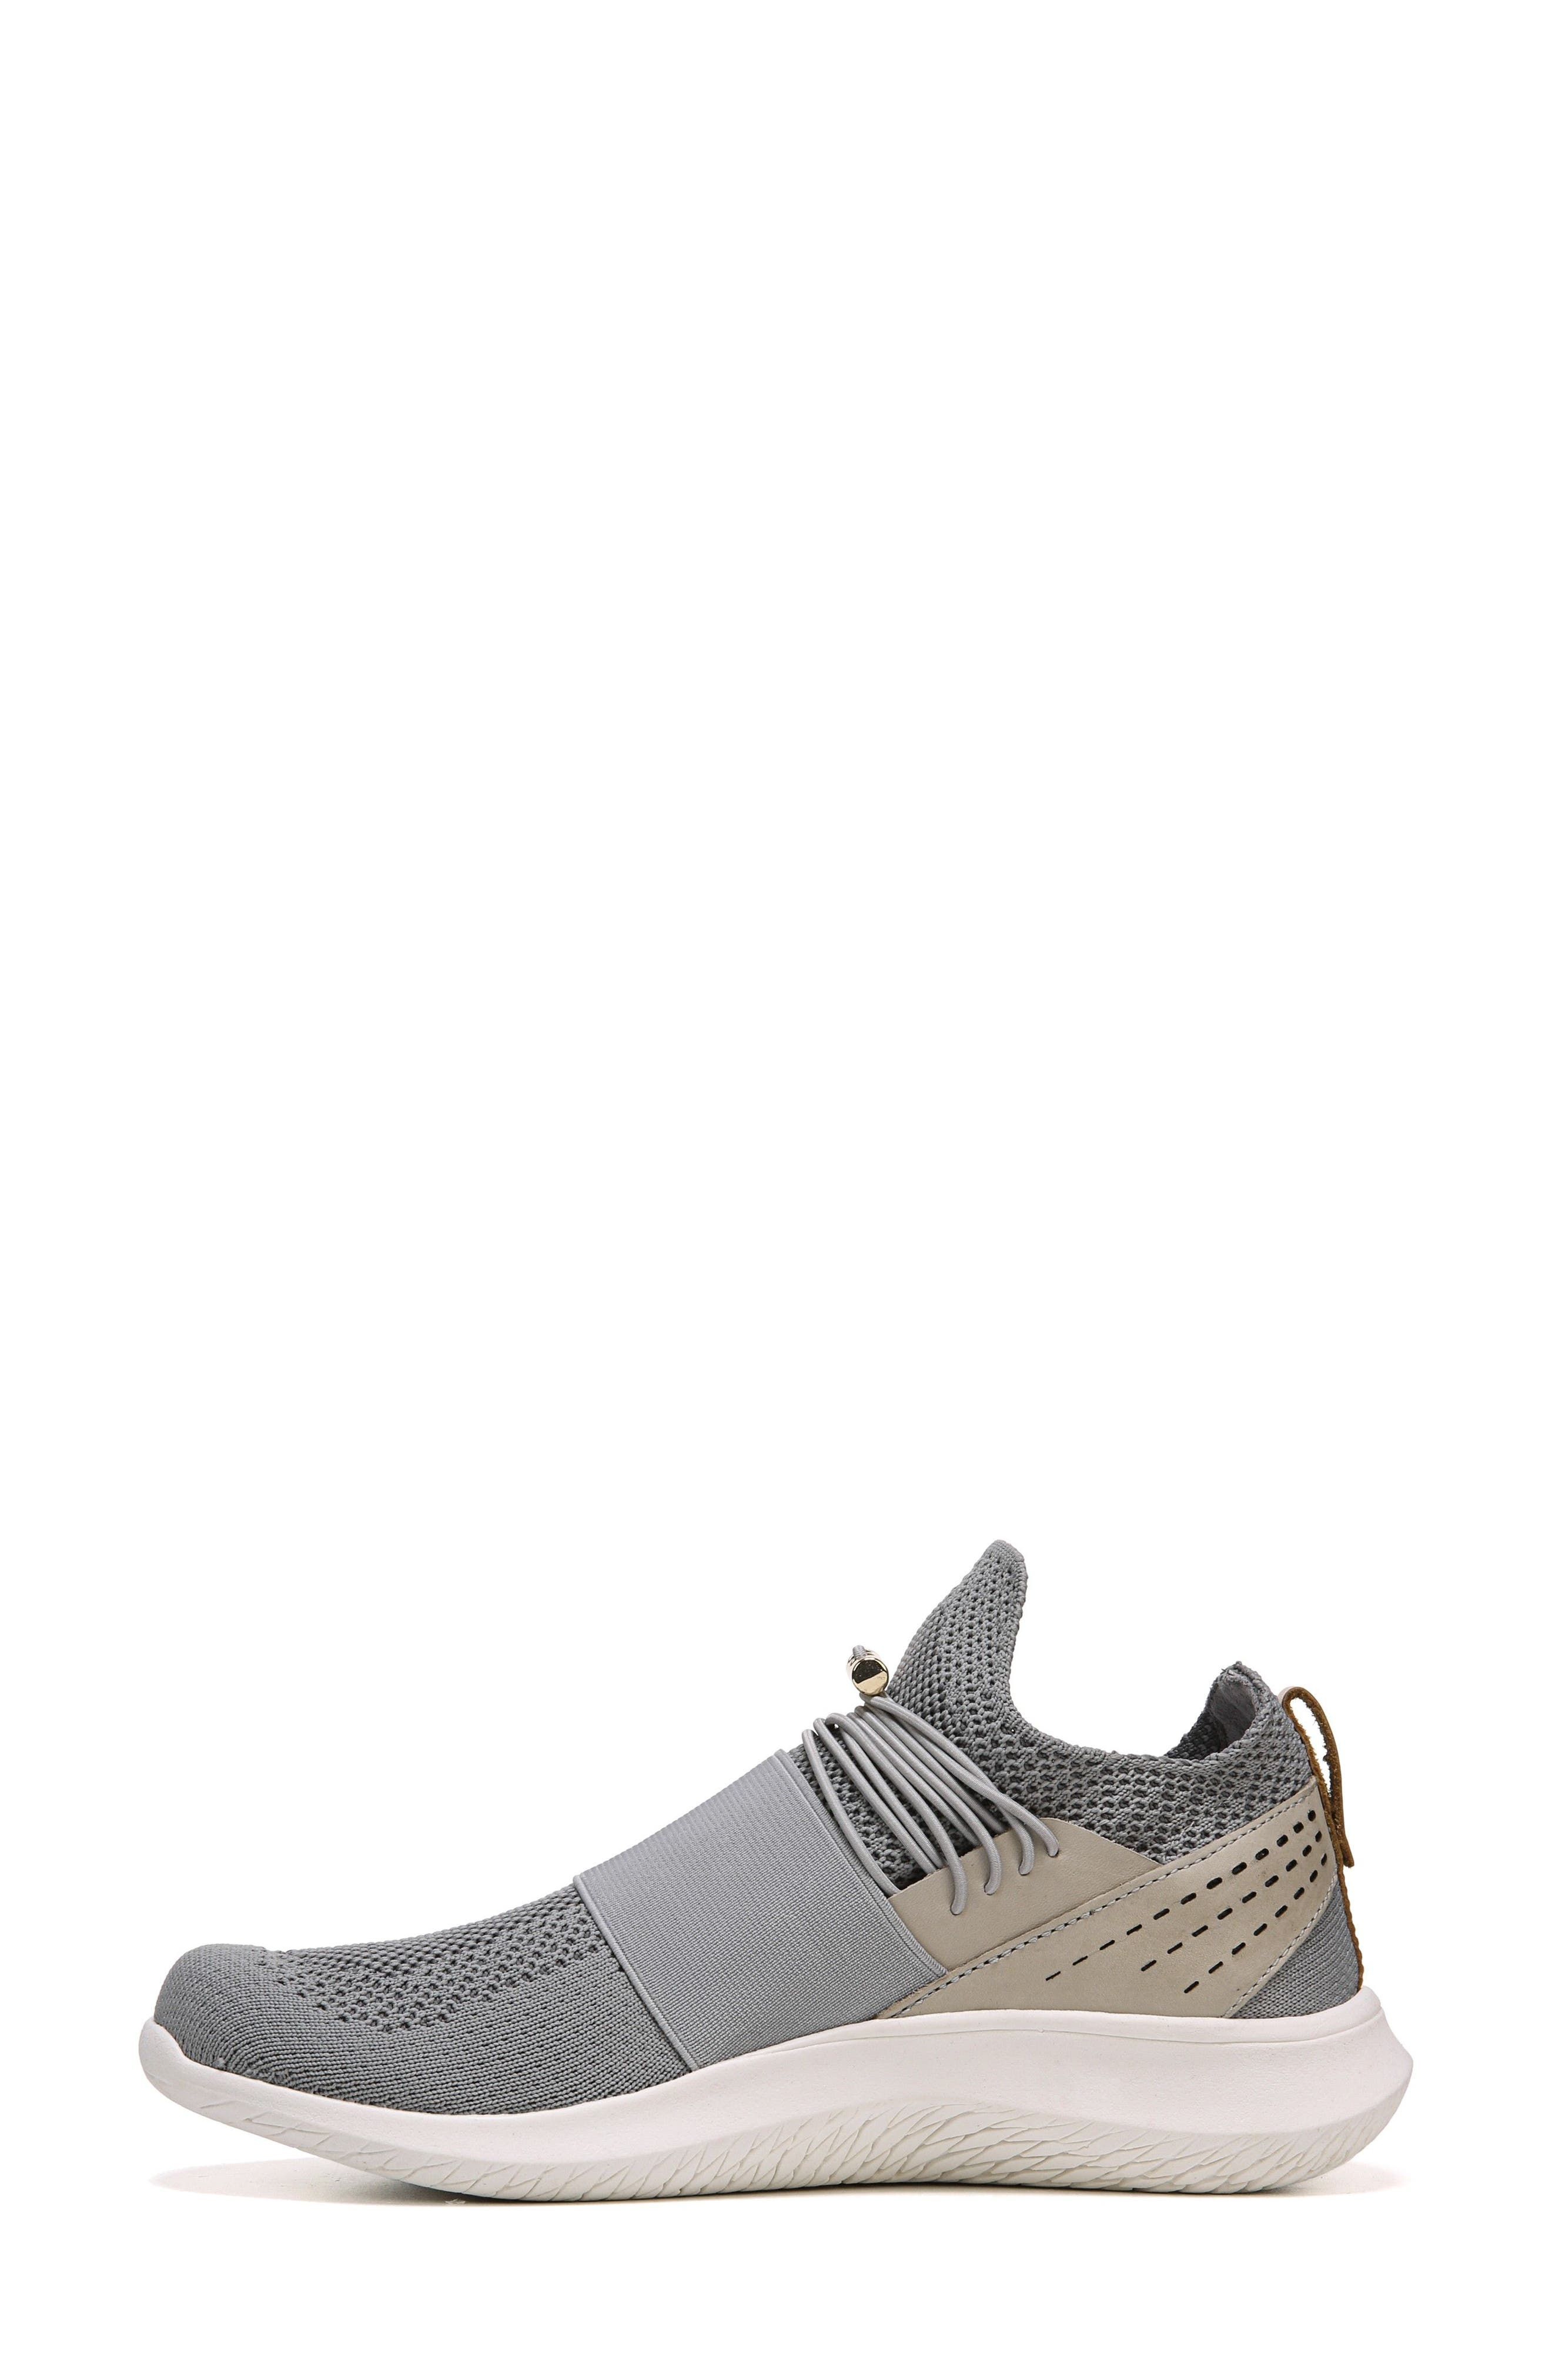 Fierce Band Sneaker,                             Alternate thumbnail 5, color,